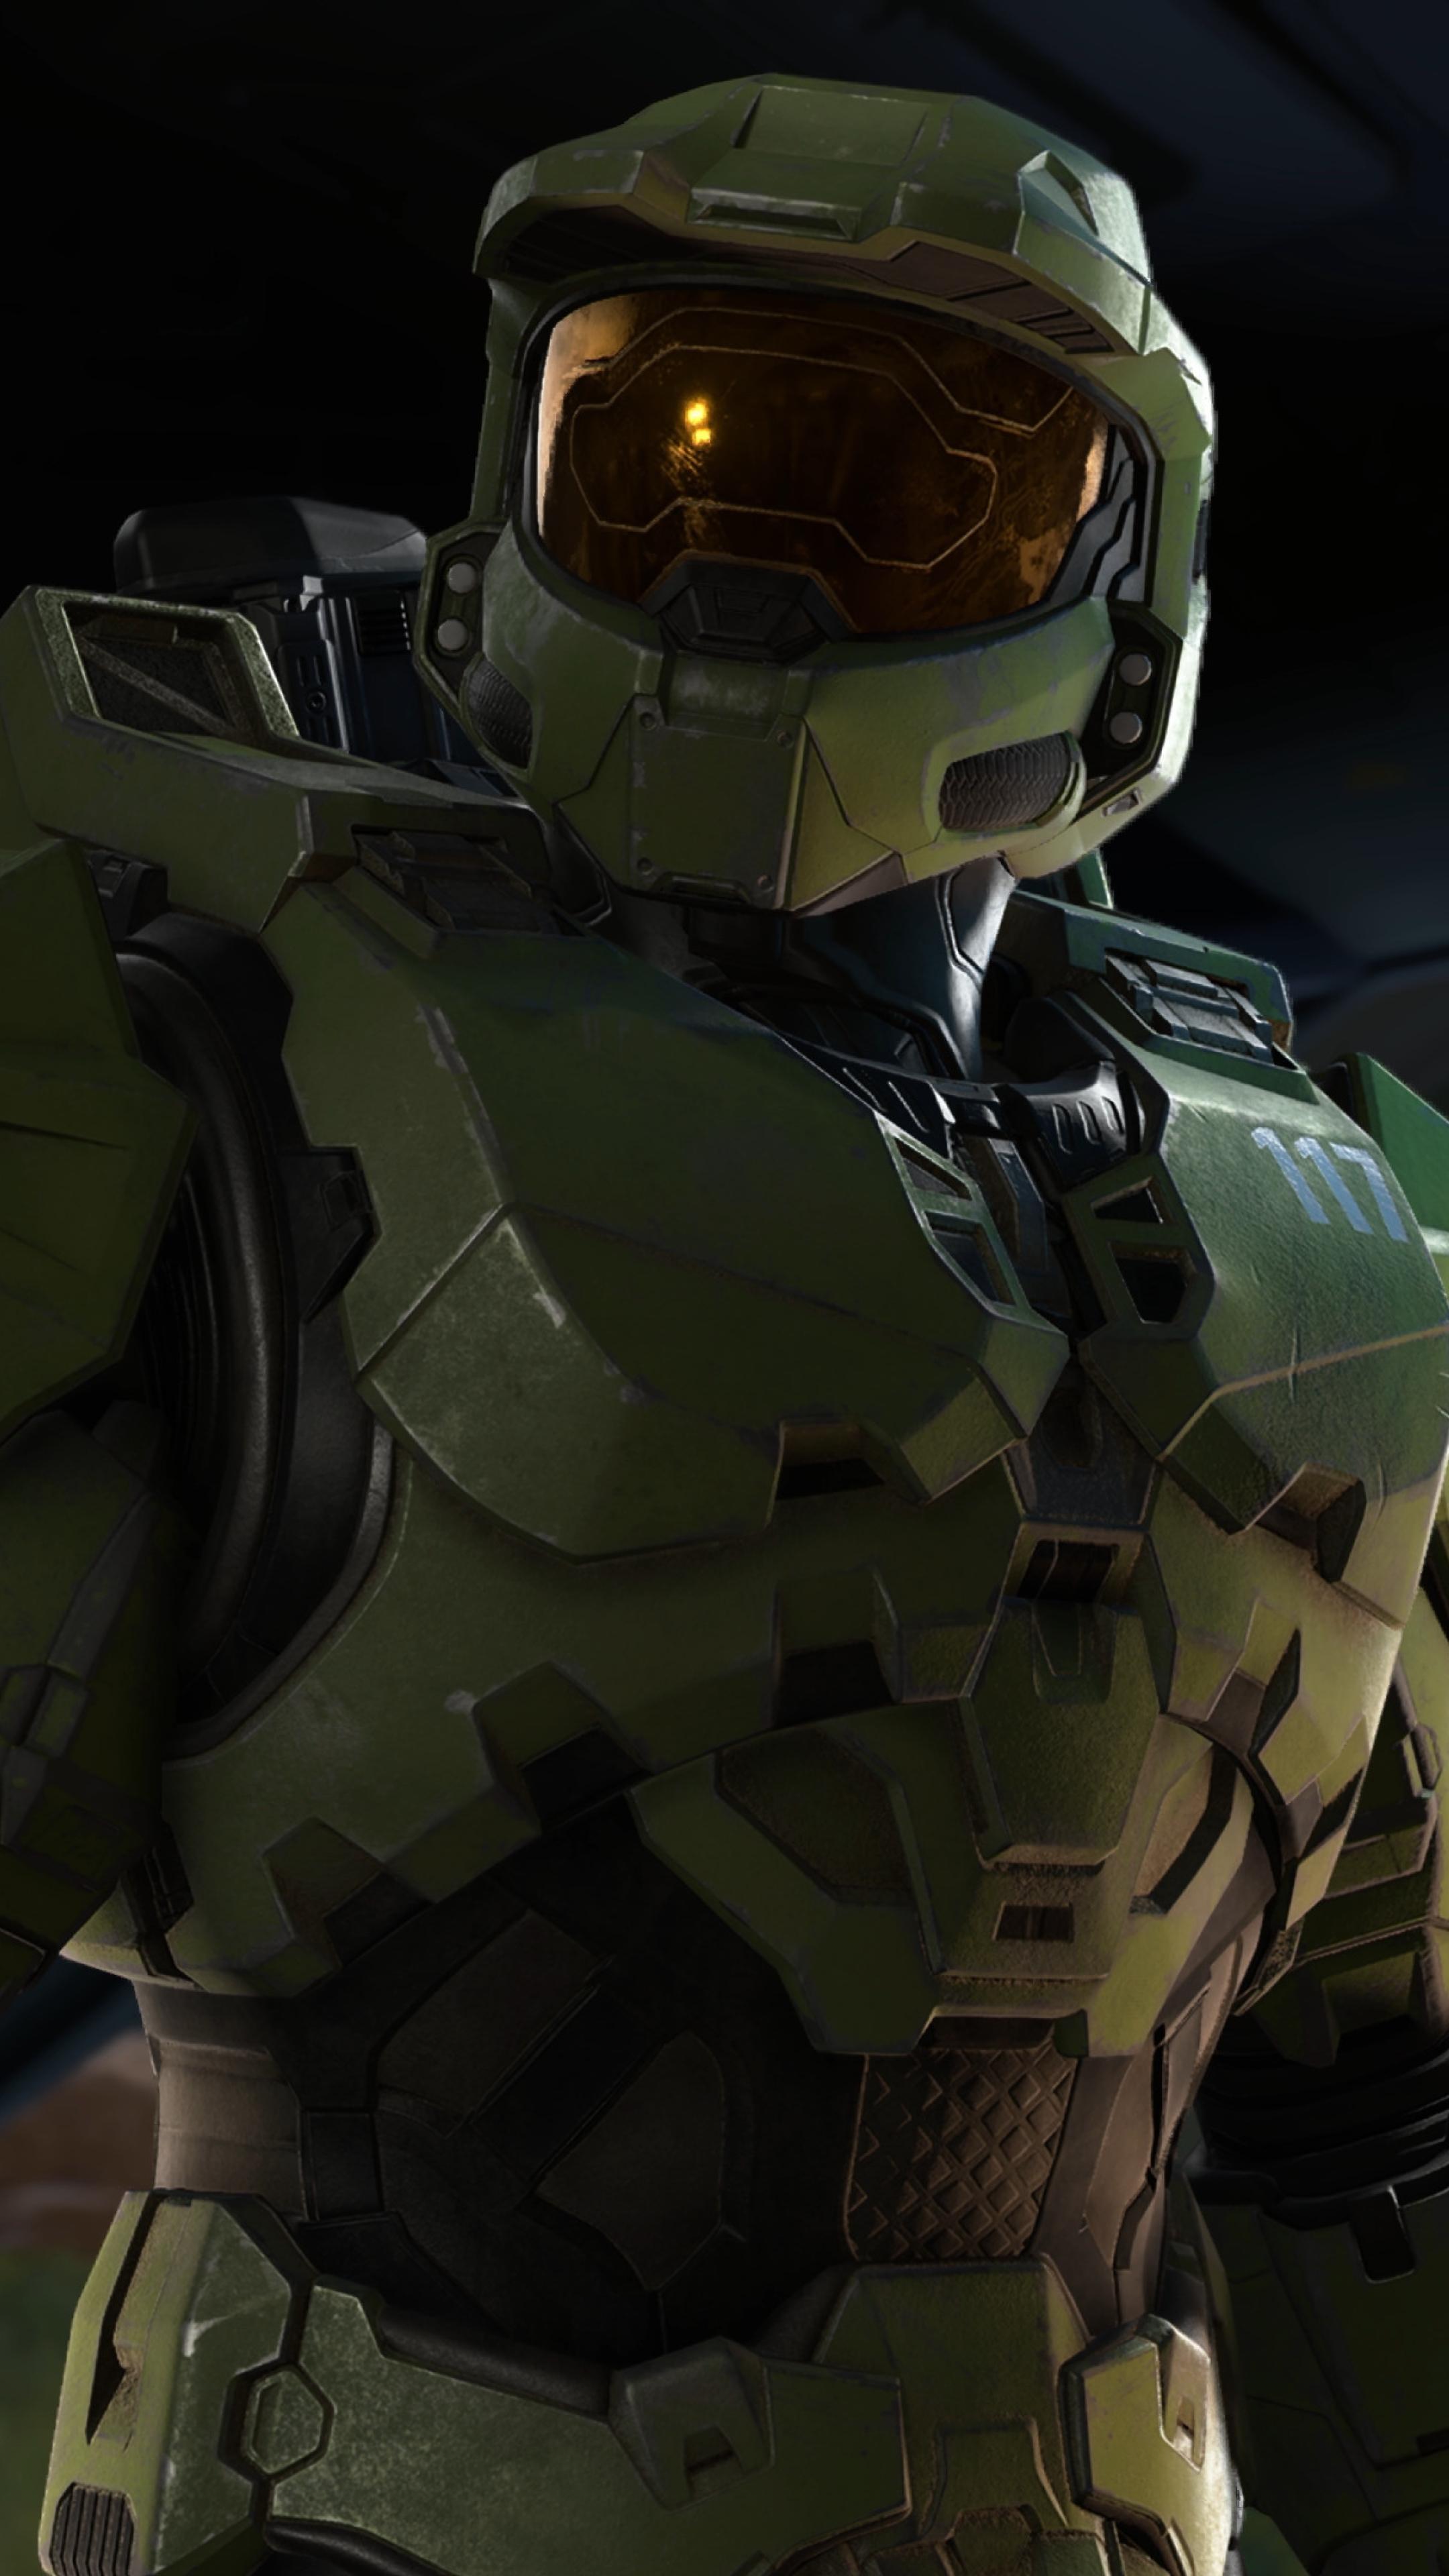 New Halo Infinite 4K Wallpaper in 2160x3840 Resolution